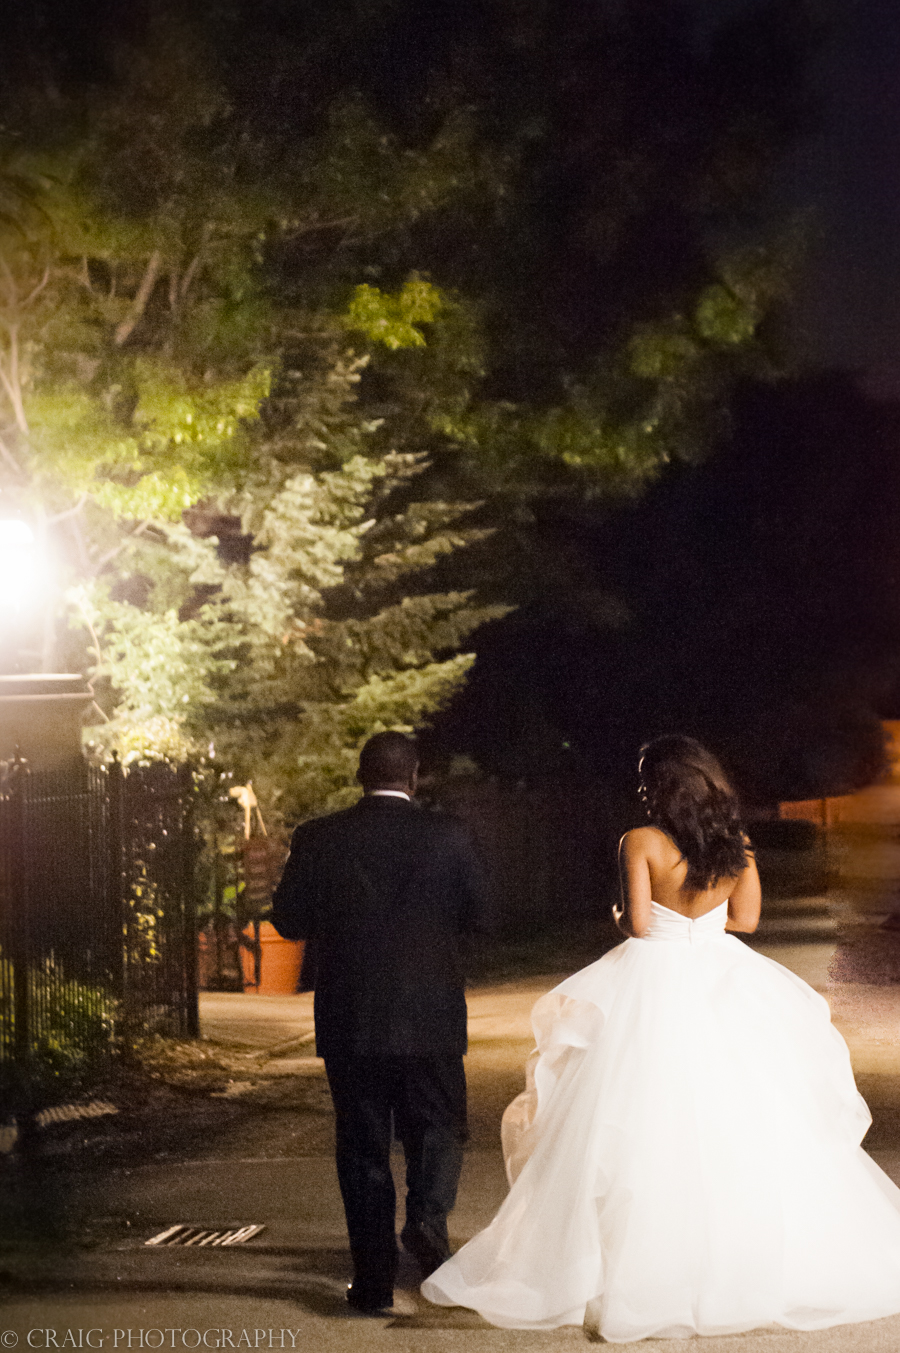 Phipps Conseratory Weddings | Wedding Photo Booth Homemade Moss Frame-0010